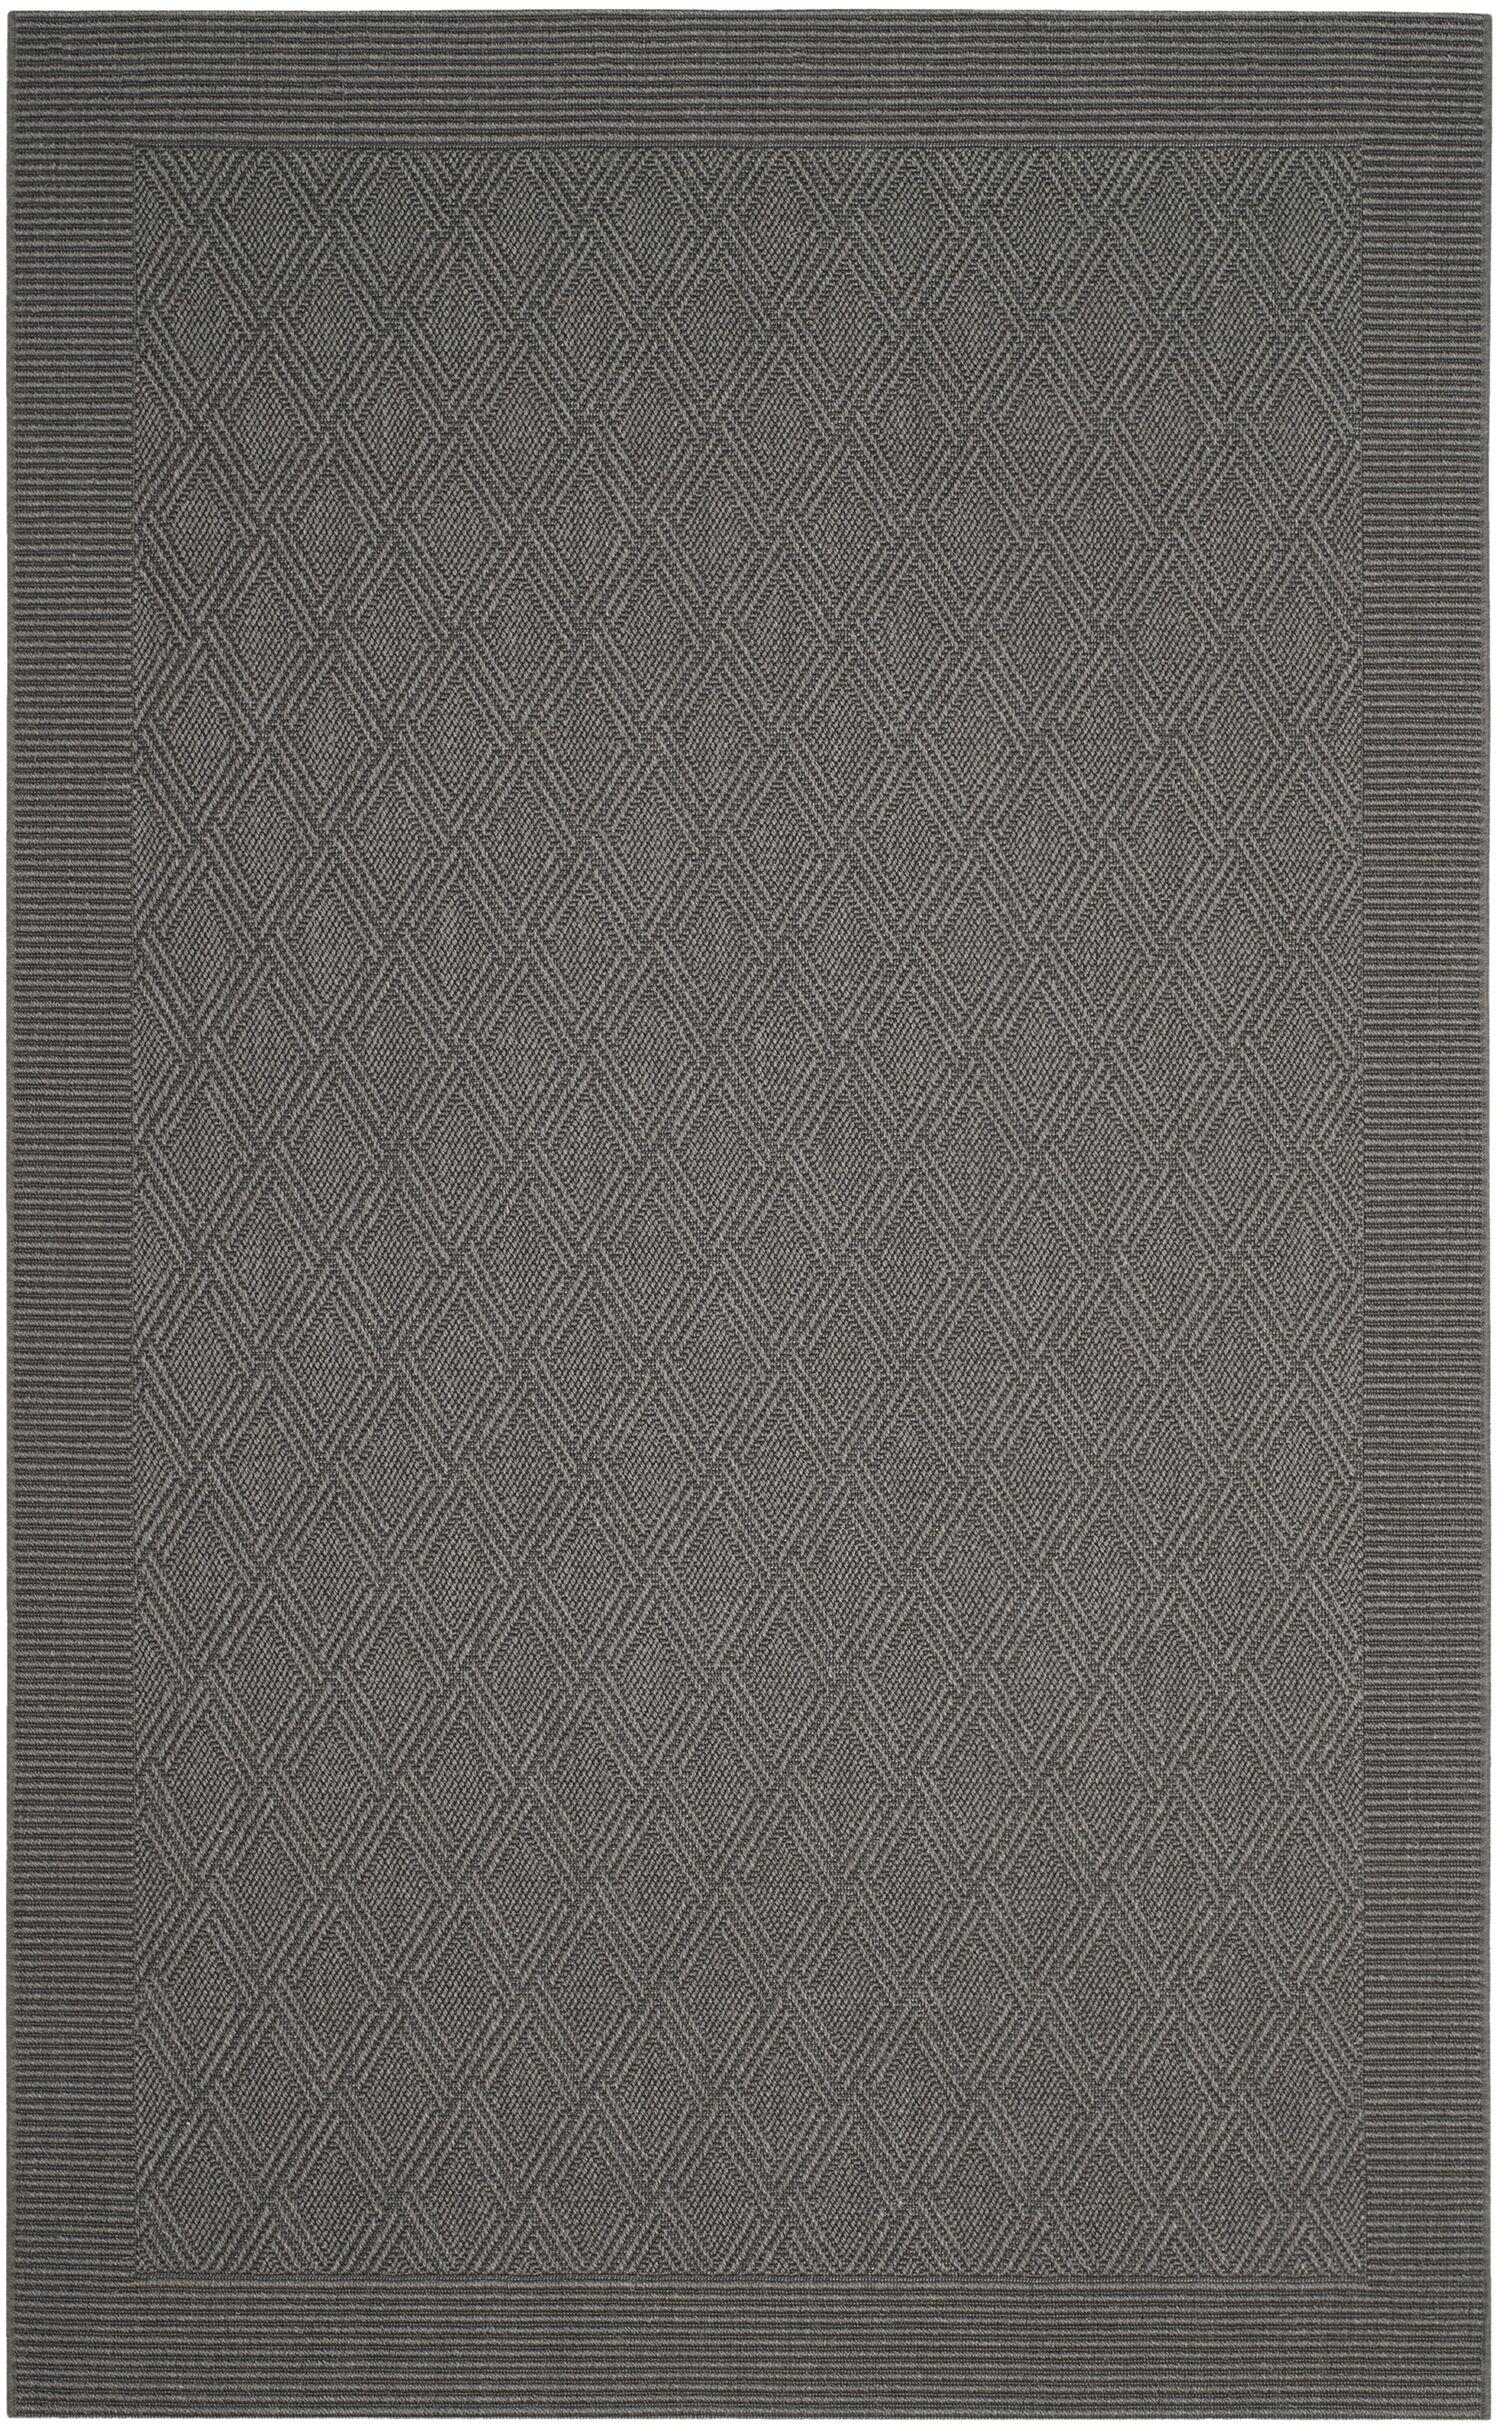 Beck Ash Area Rug Rug Size: Rectangle 5' x 8'